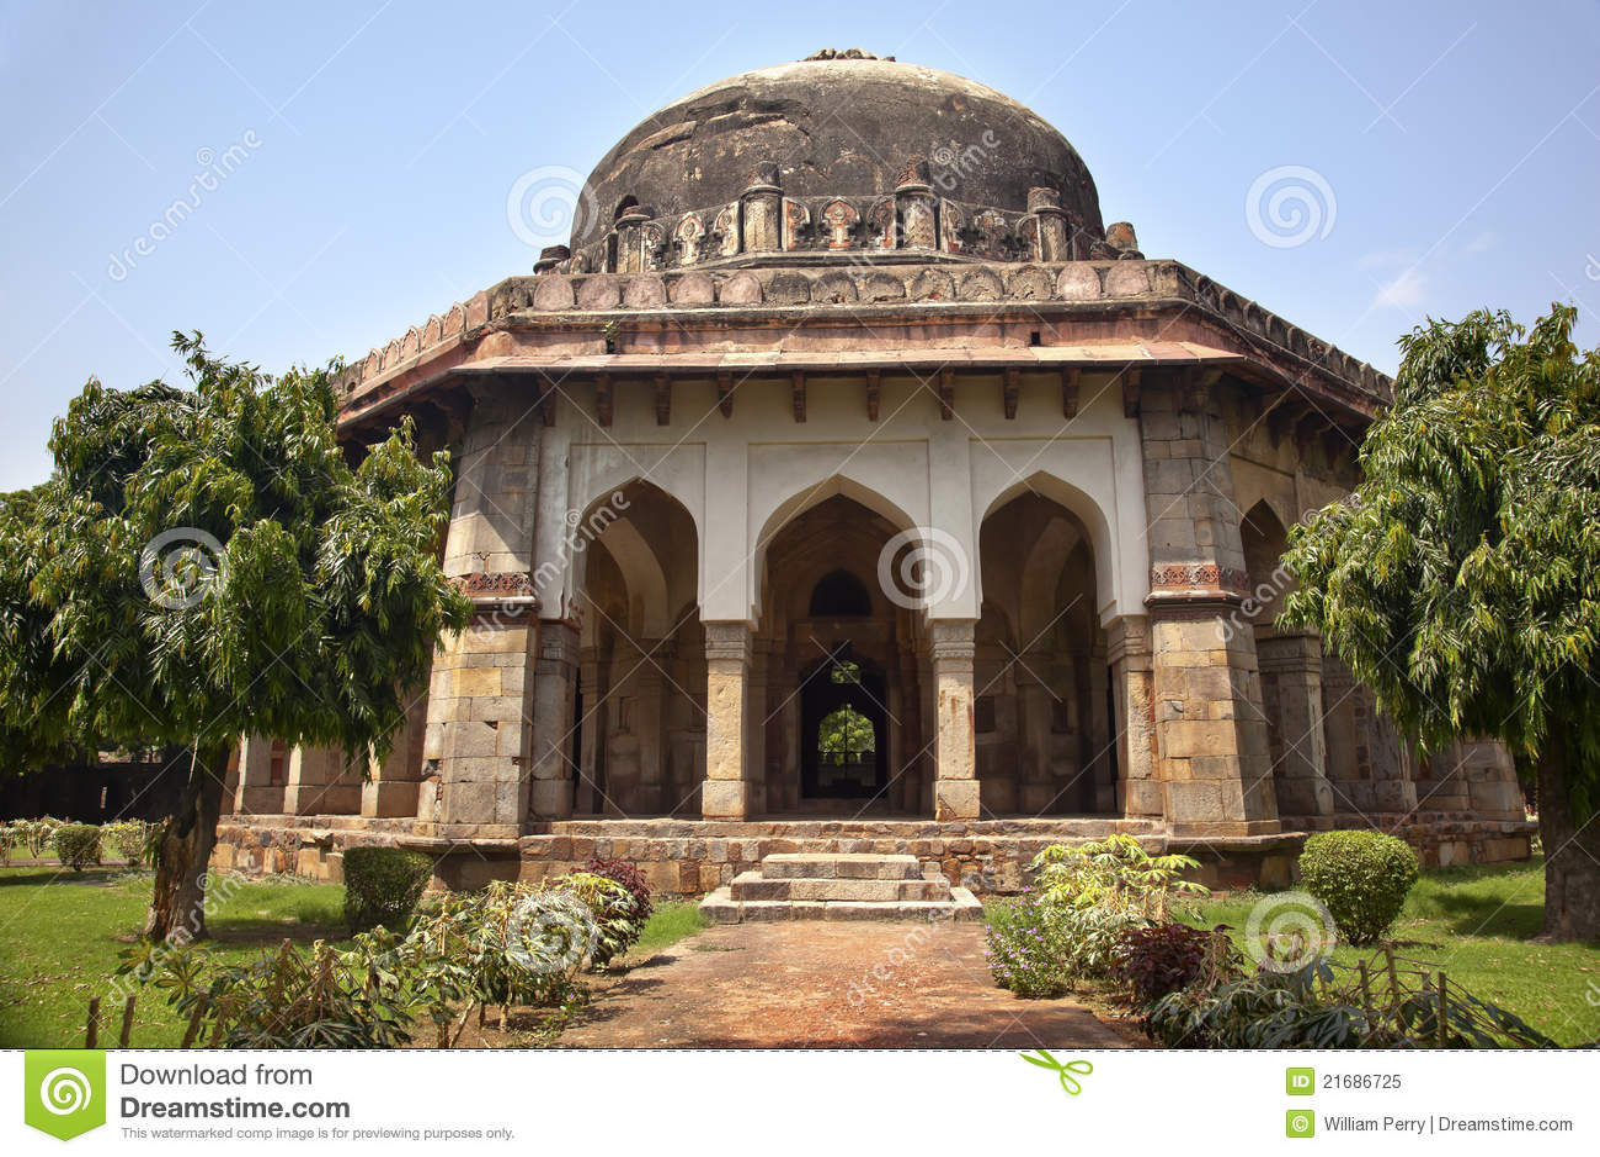 De Tuinen New Delhi India van het Graf van Lodi van Sikandar